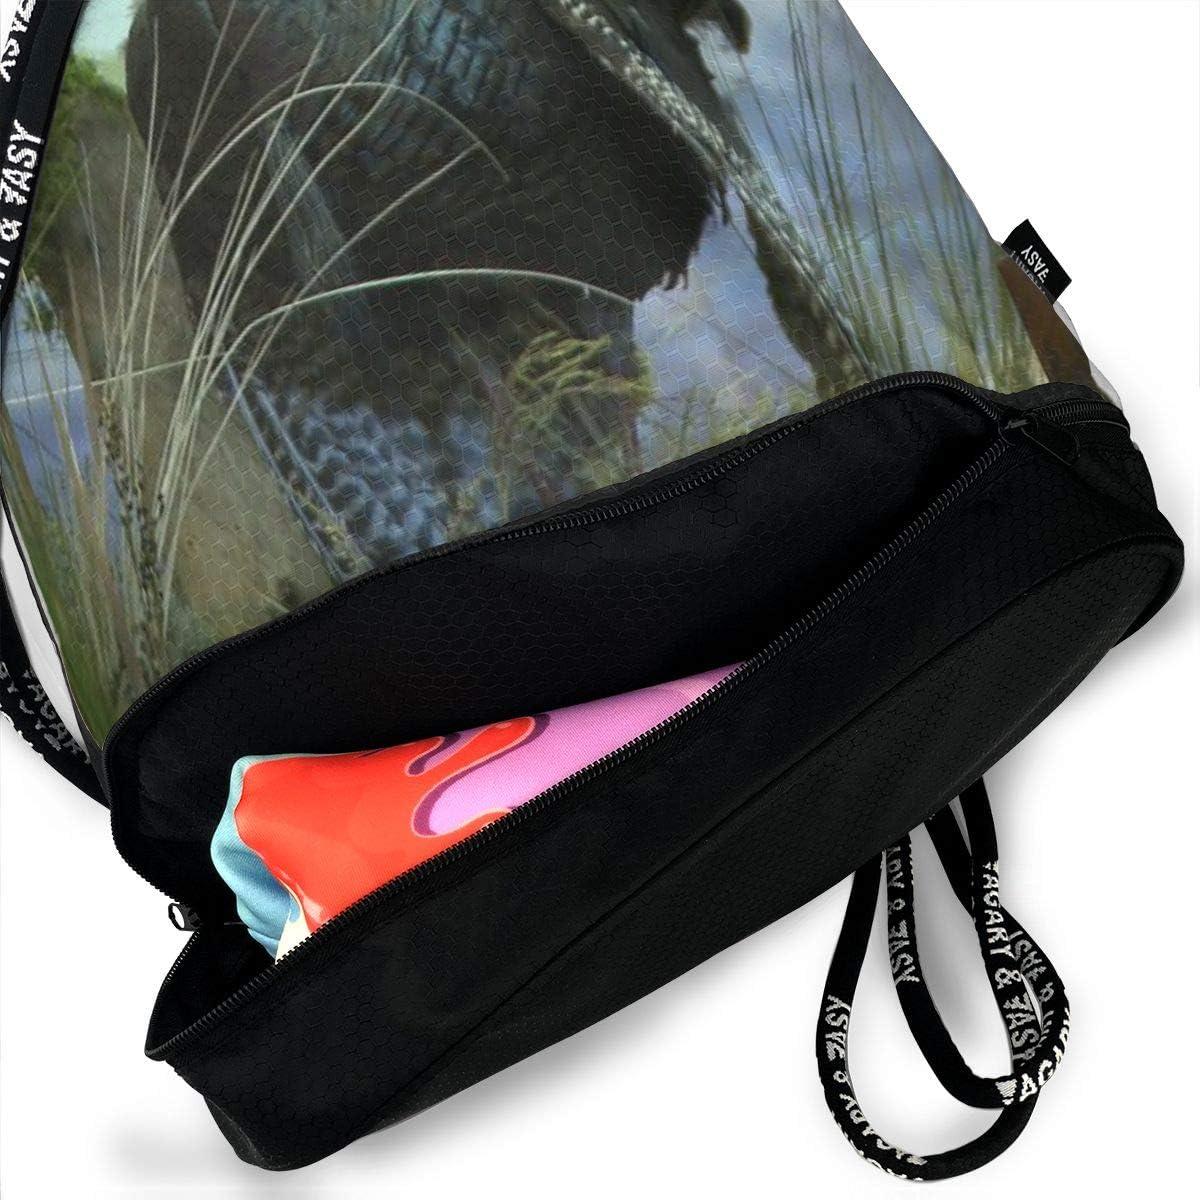 GymSack Drawstring Bag Sackpack Cute Turkey Sport Cinch Pack Simple Bundle Pocke Backpack For Men Women